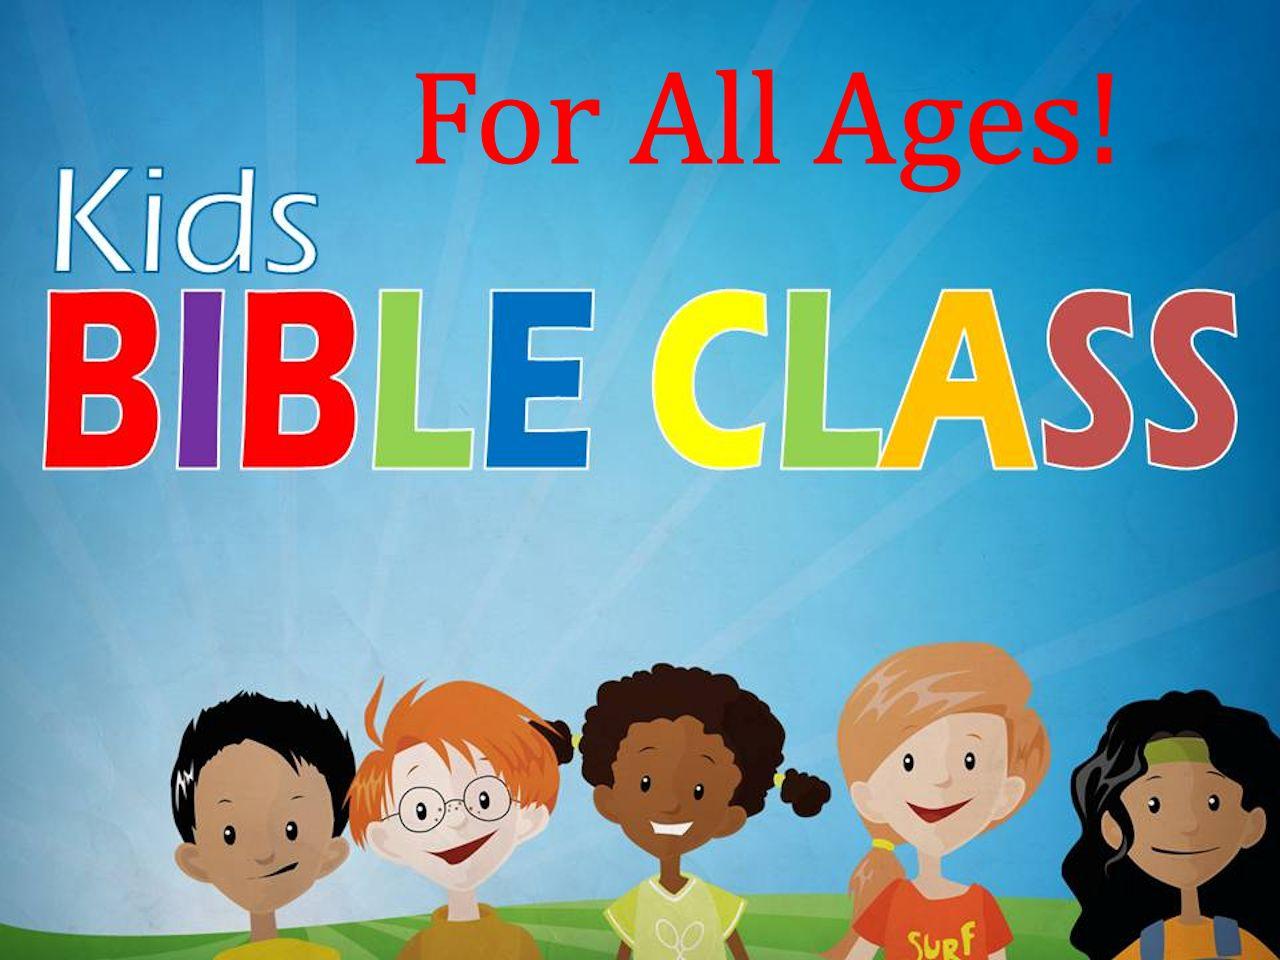 Christian Bibles for Kids - Christianbook.com